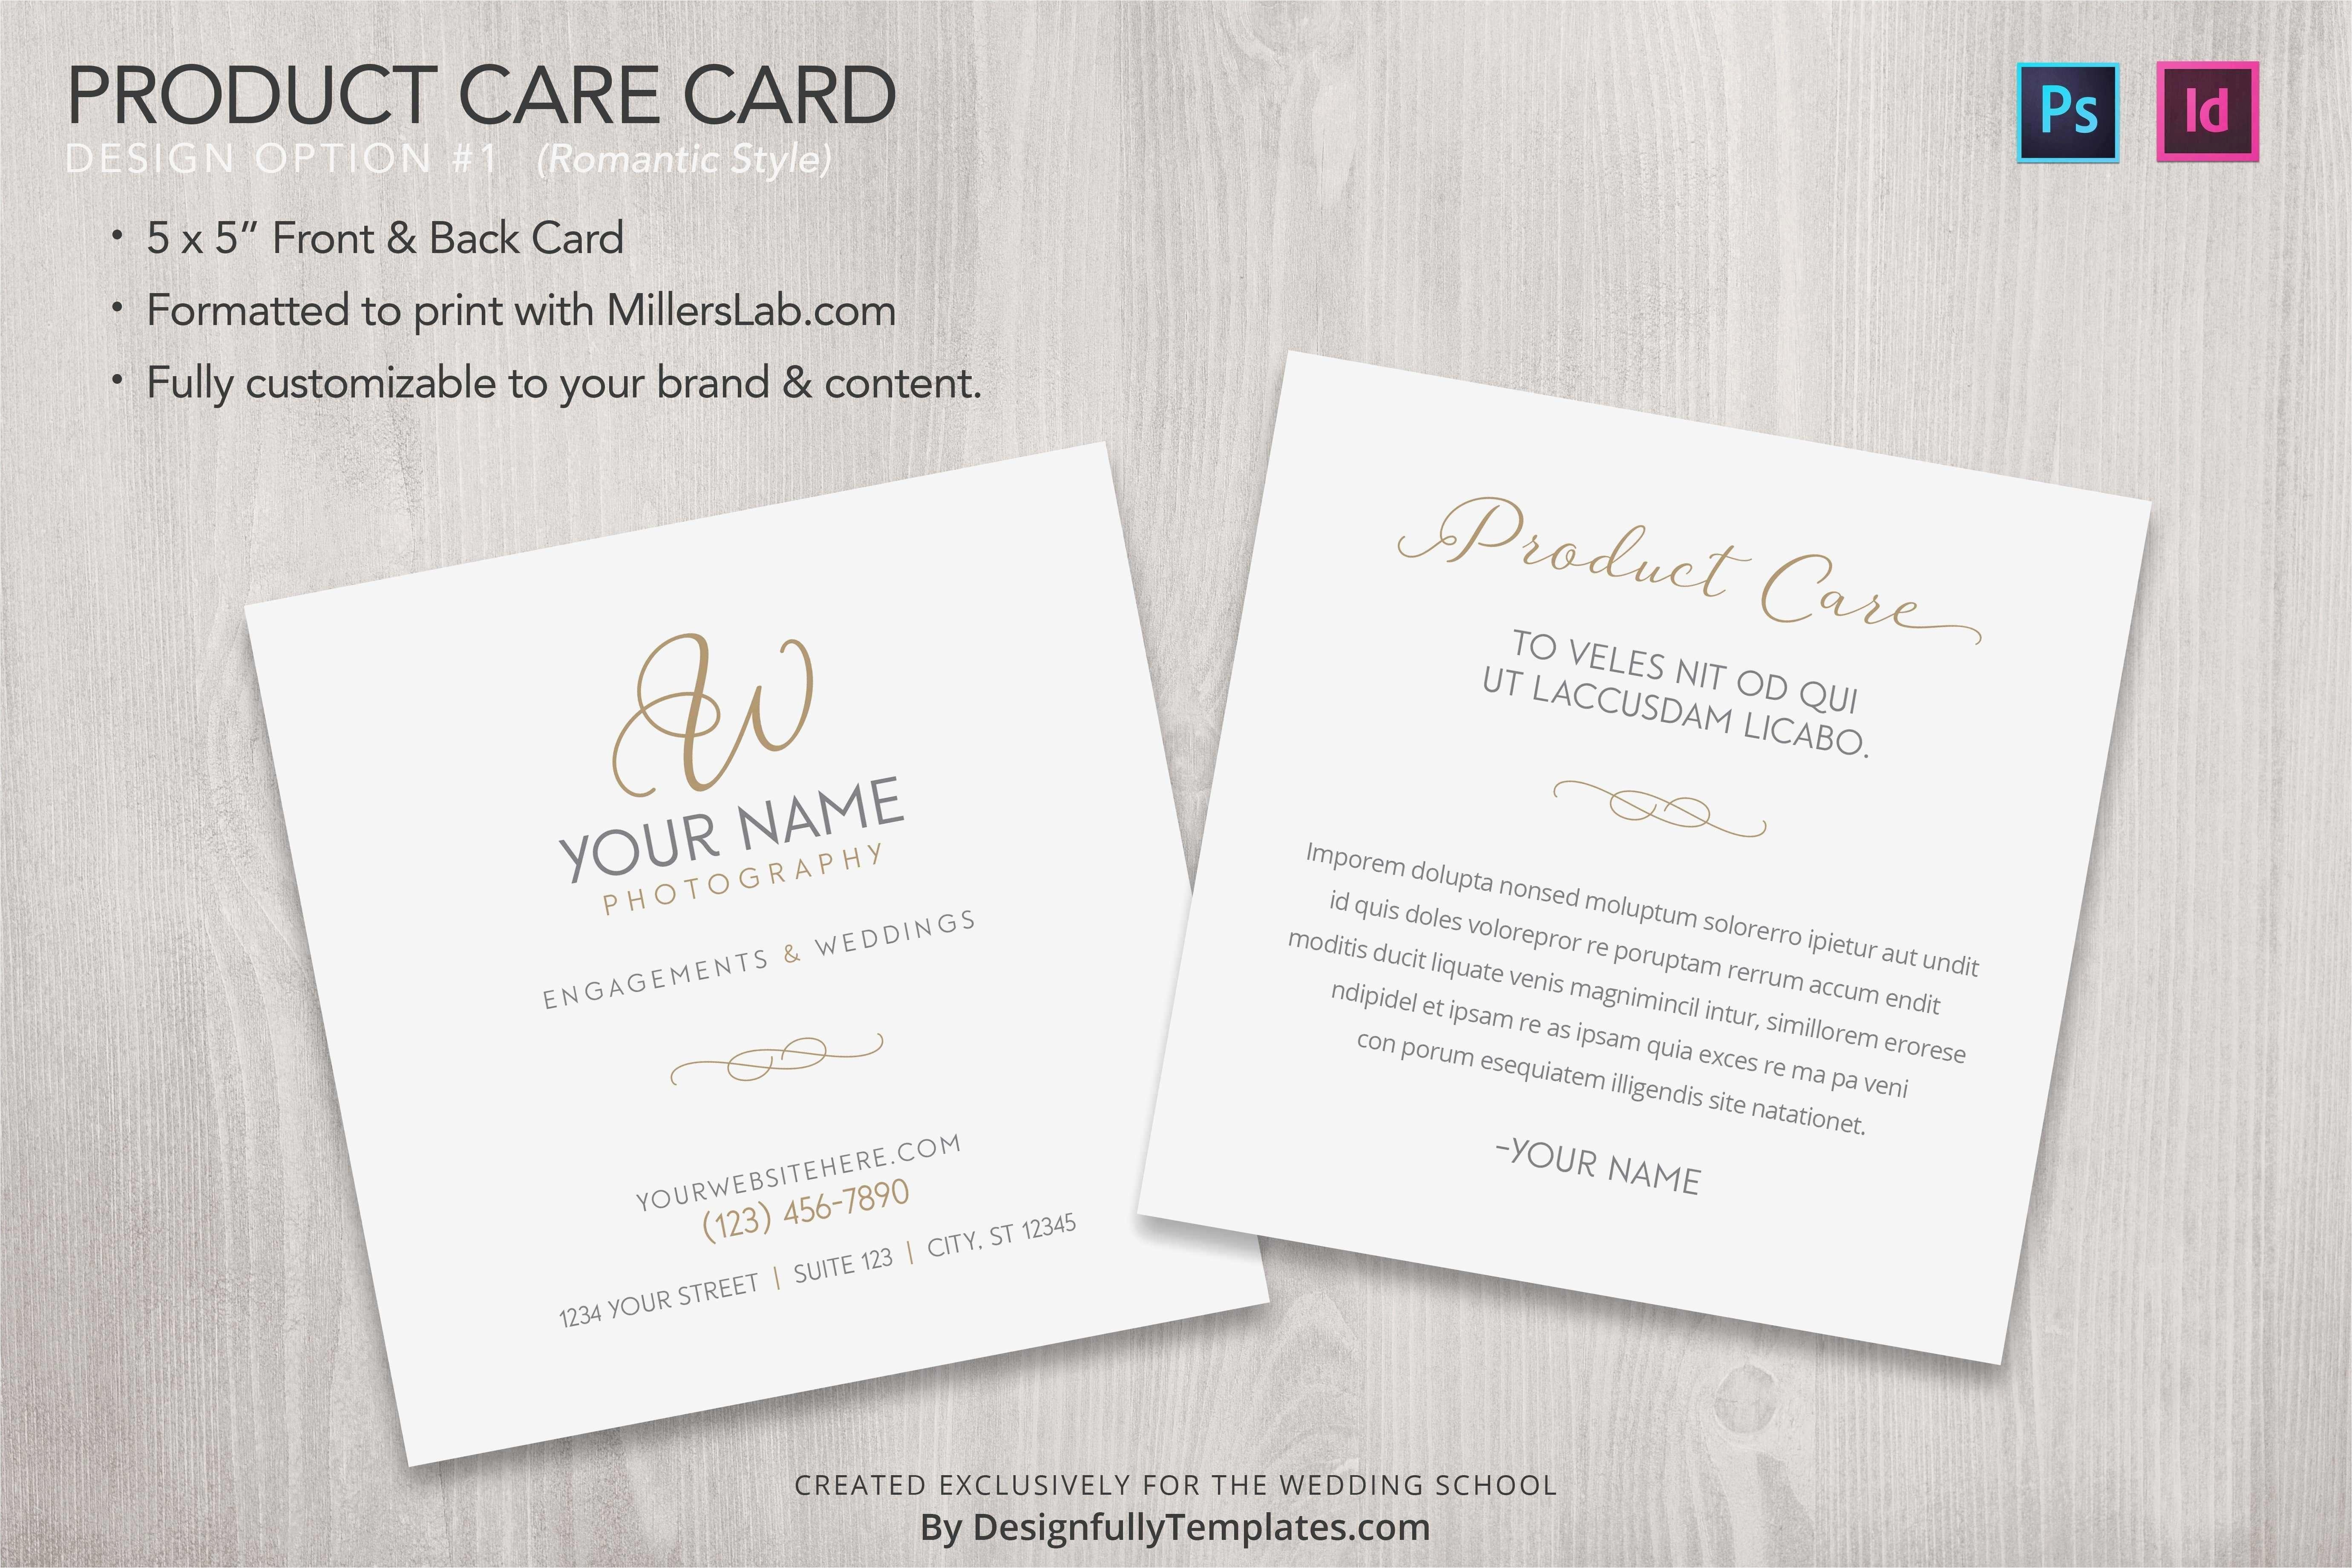 Wedding Response Card Template Free Inspirational Wedding Response Card Template Model Traditional Wedding